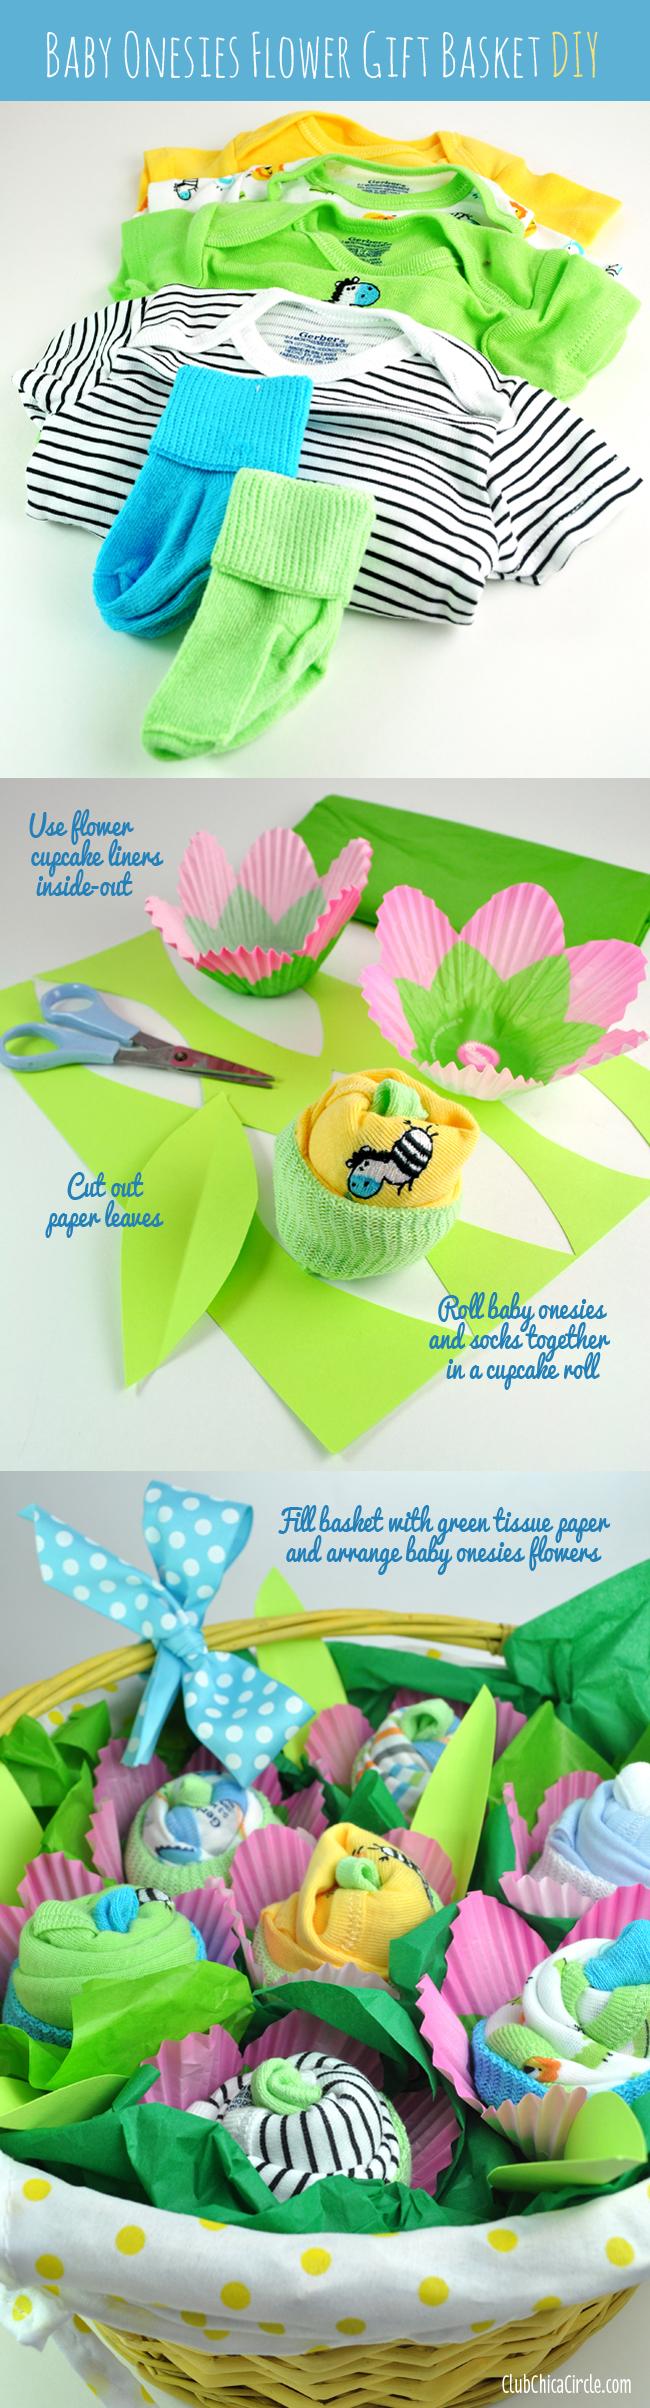 baby onesies for flower basket gift easy tutorial